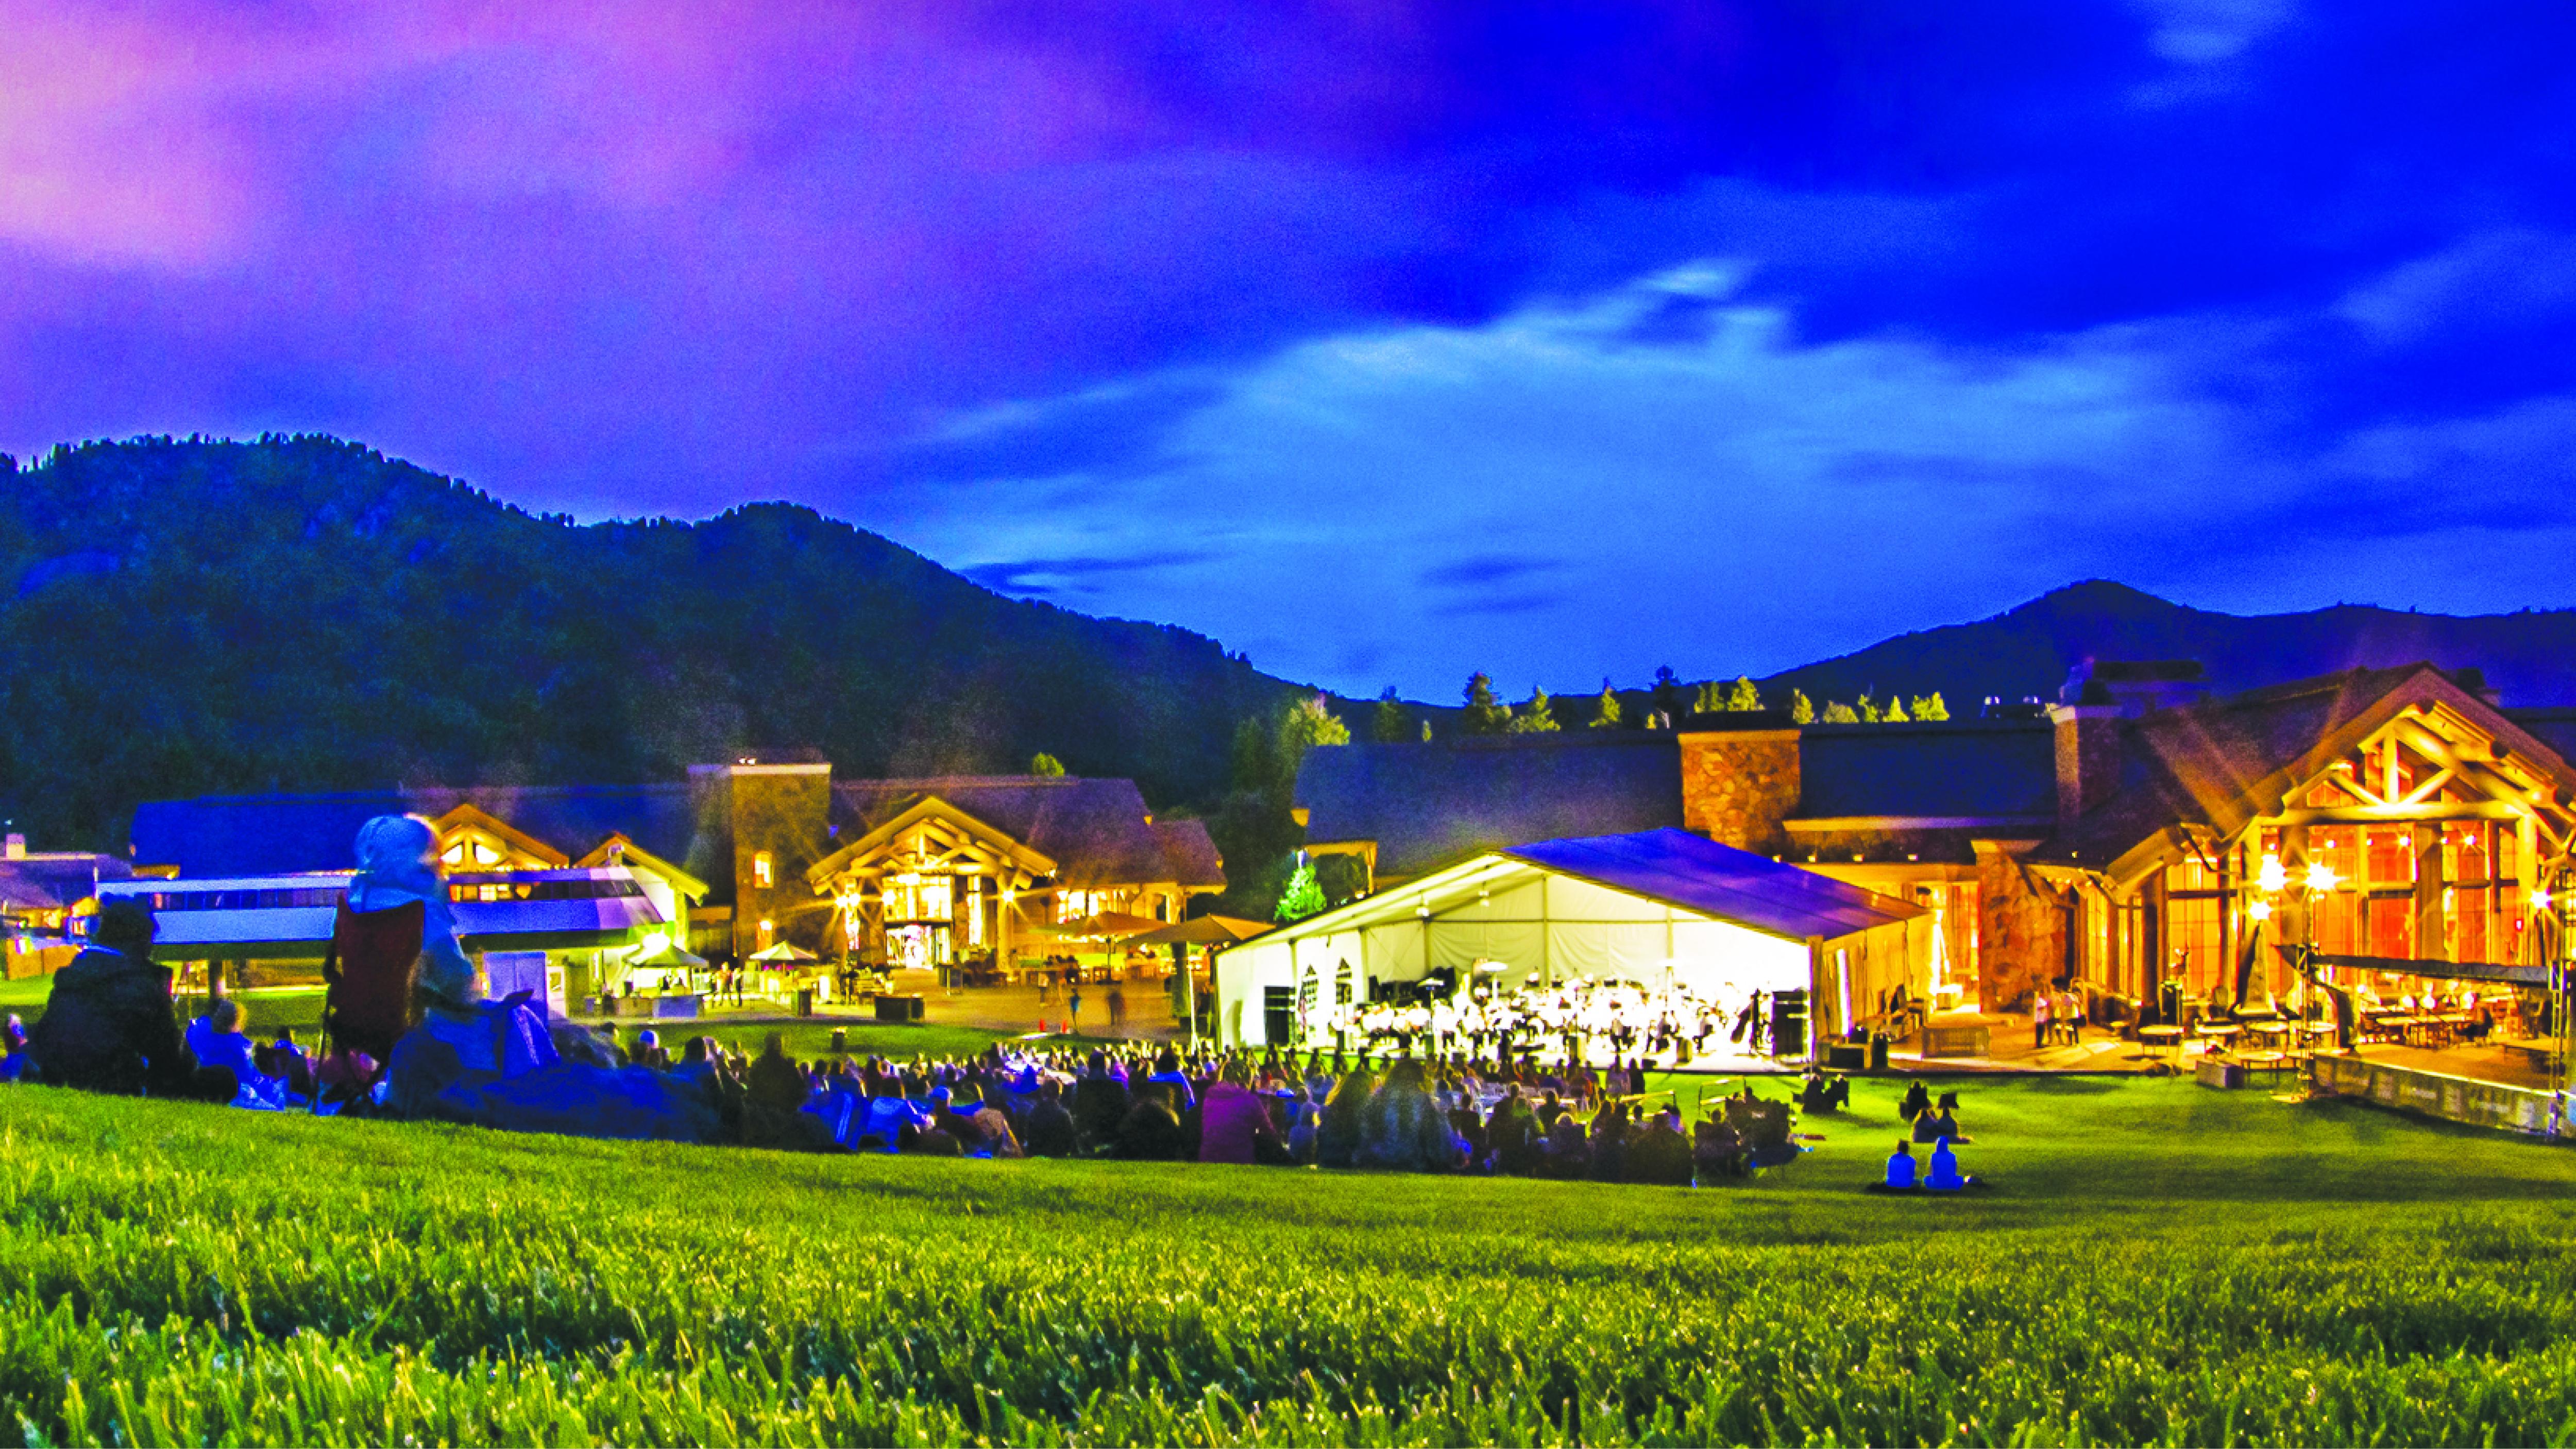 Utah Symphony's Patriotic Celebration at Snowbasin - July 3rd